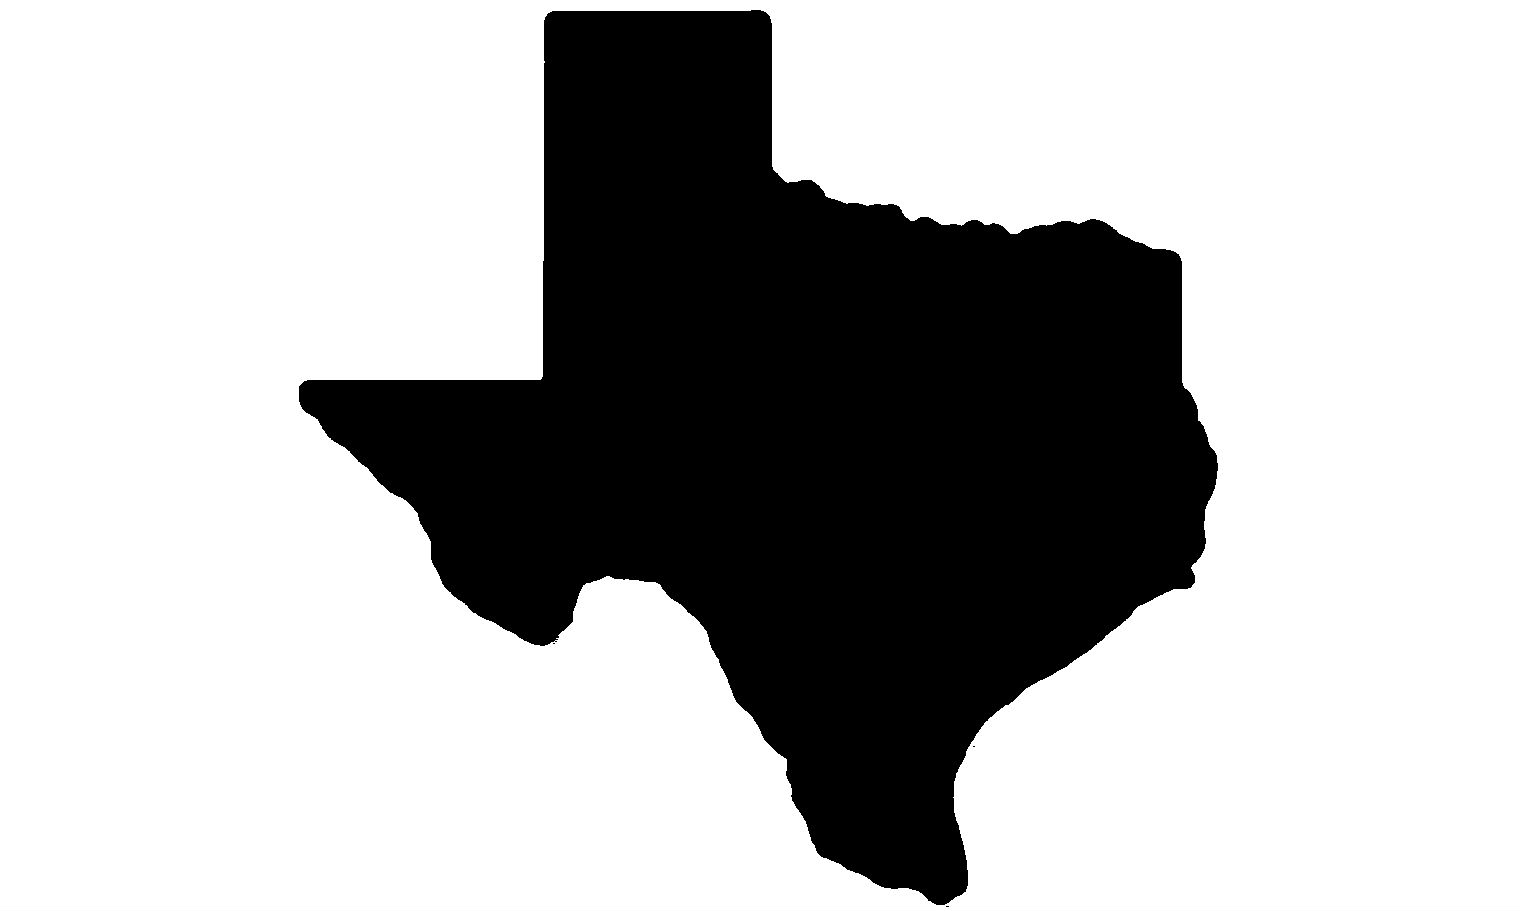 TexasOutline